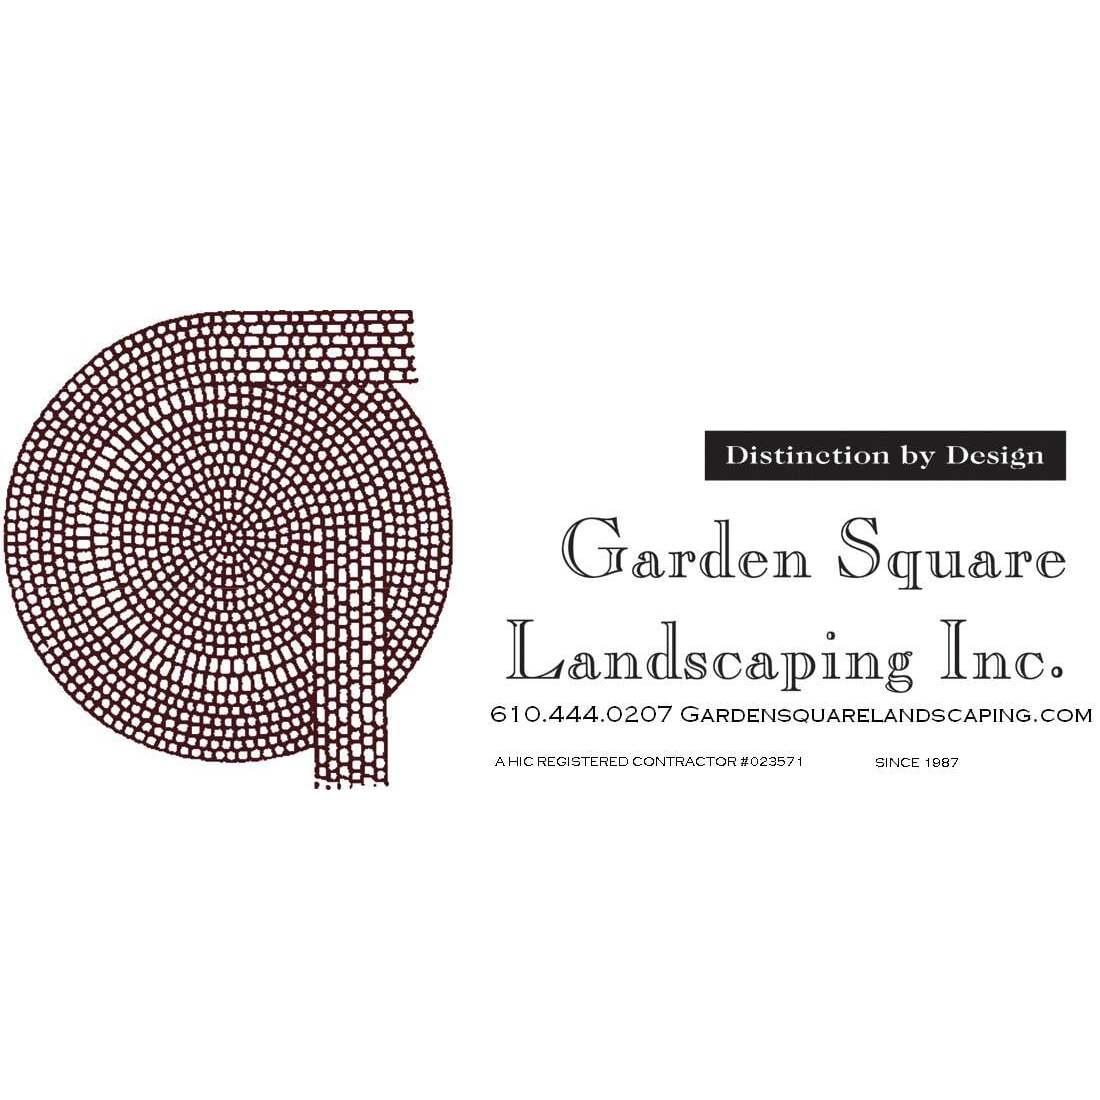 Garden Square Landscaping Inc.